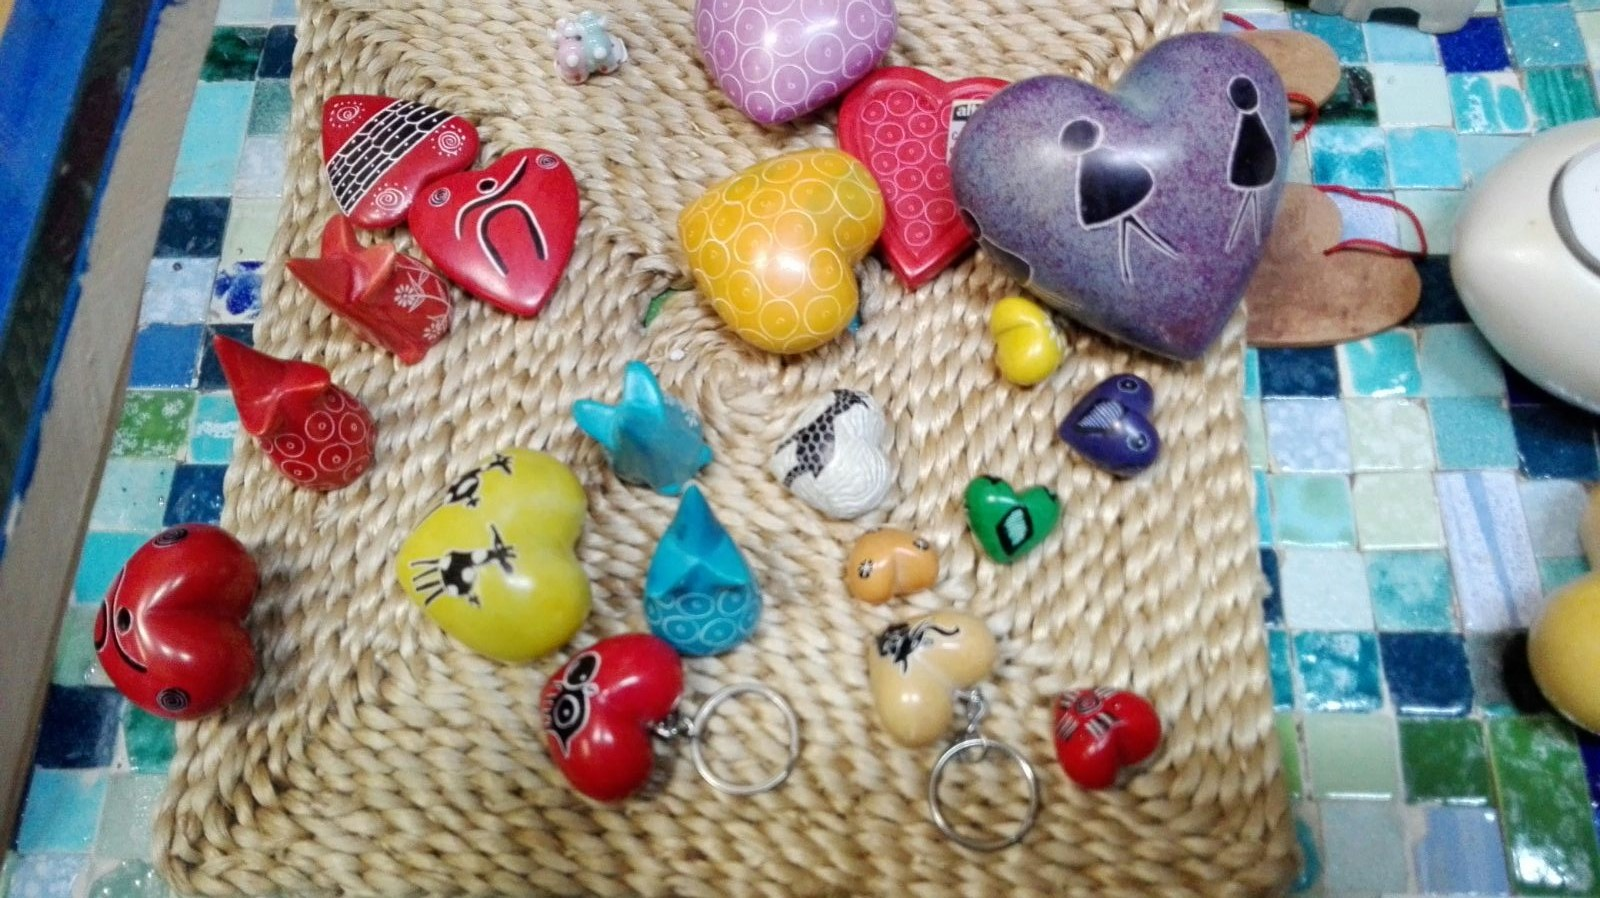 San Valentino idee regalo equosolidali-pensierini3